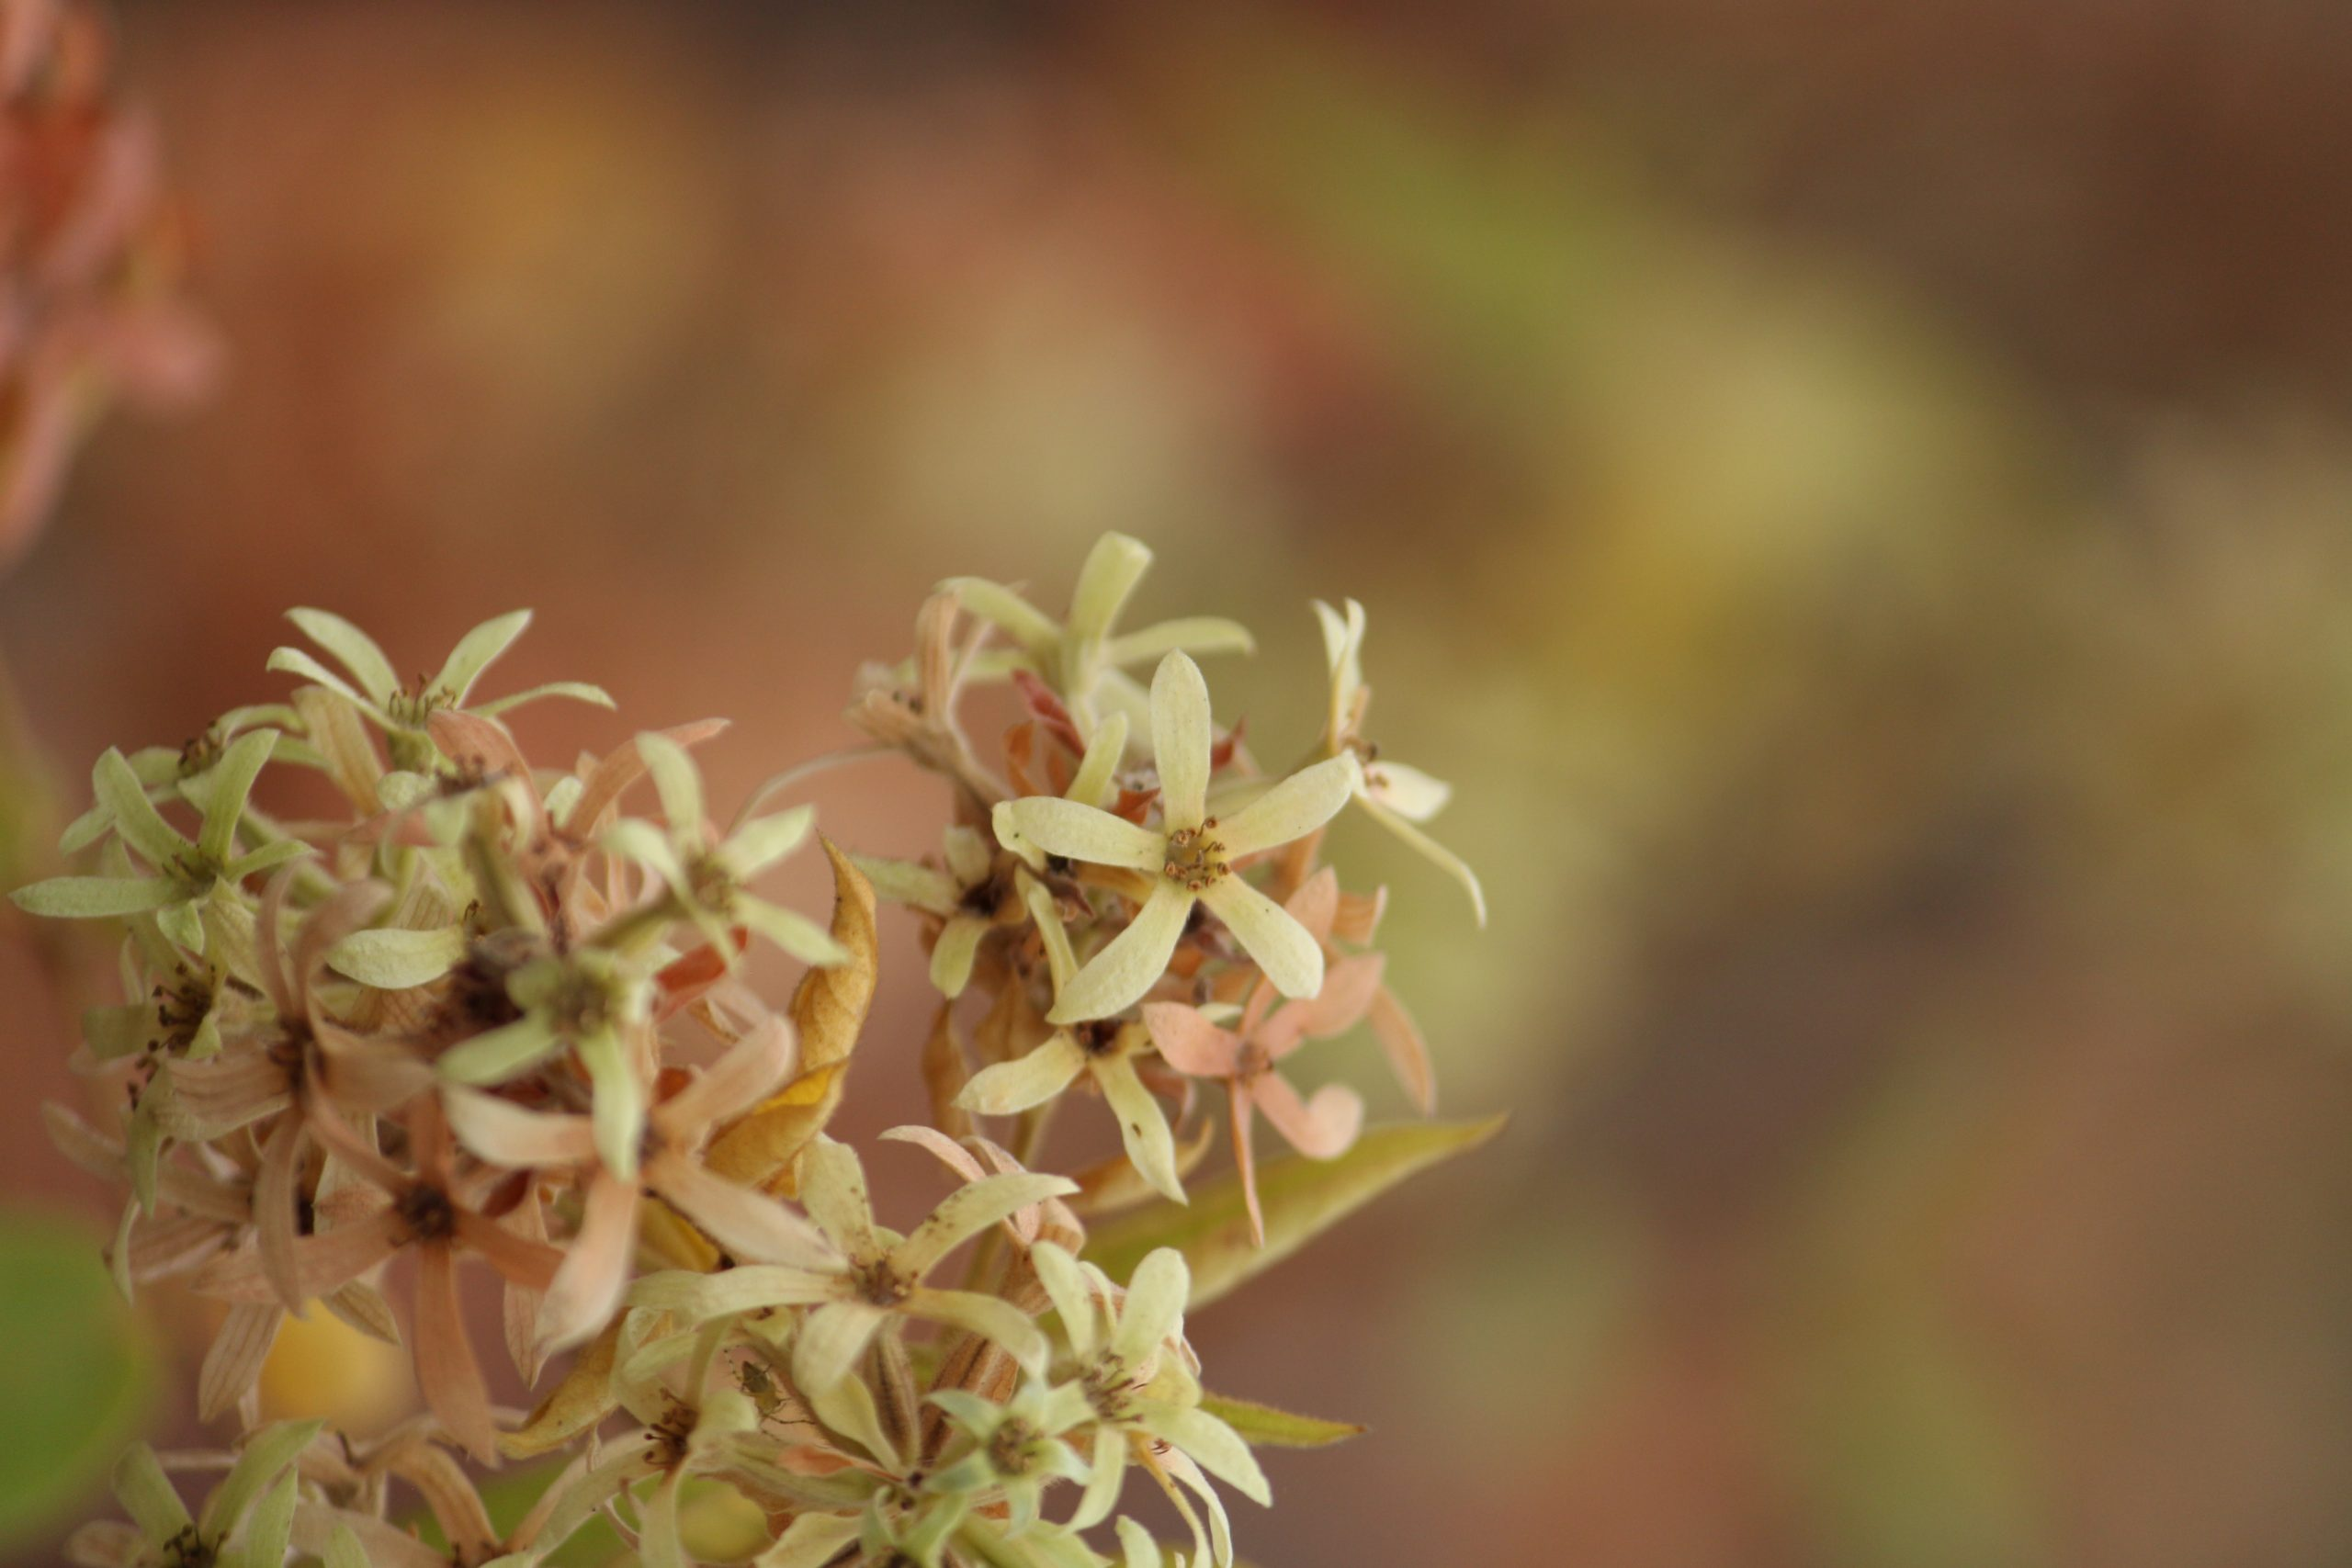 Paperflowers plant